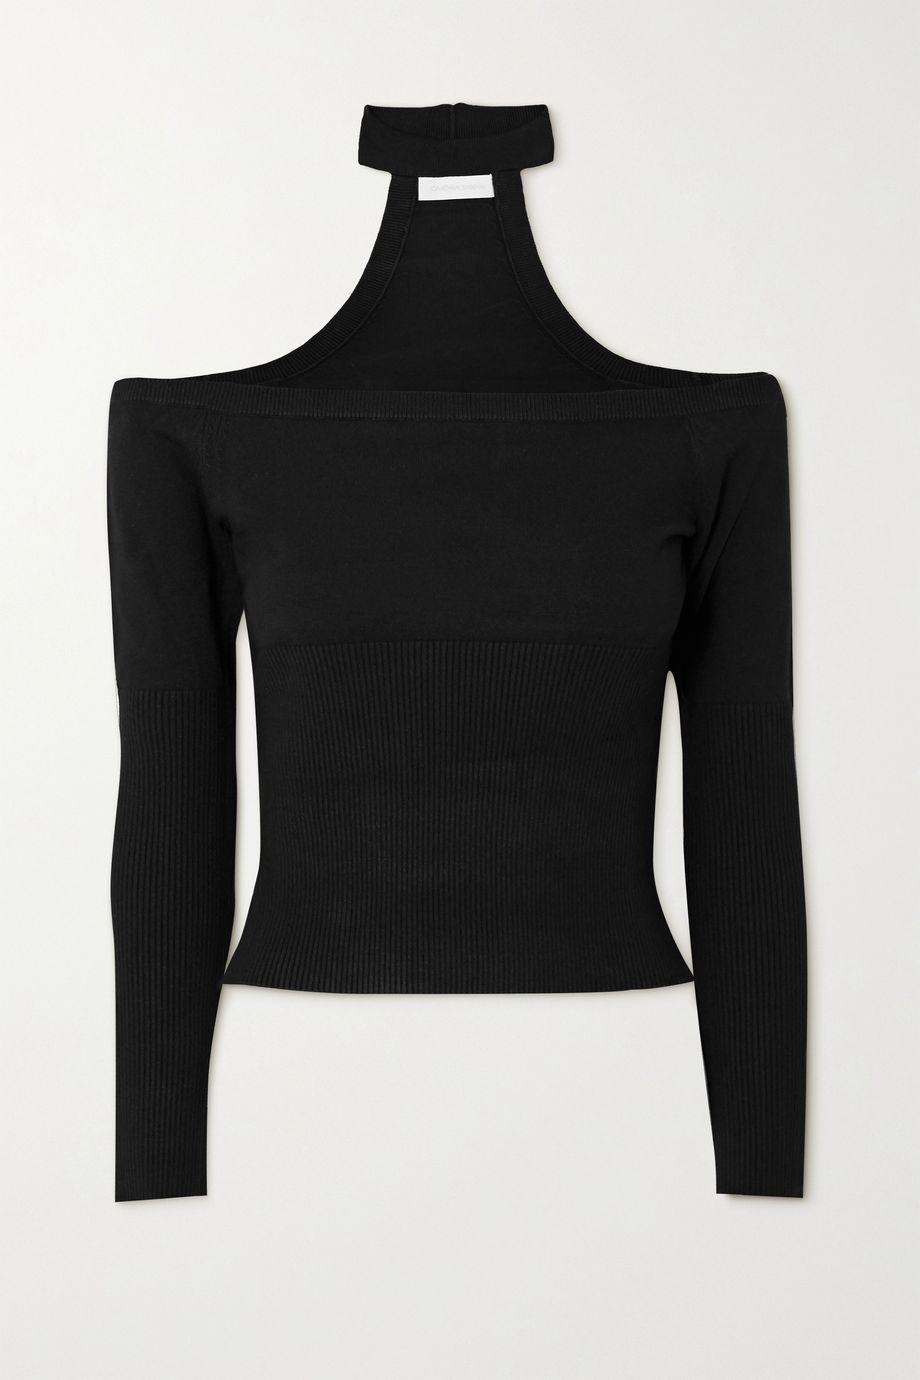 Jonathan Simkhai Lila off-the-shoulder cutout ribbed-knit top